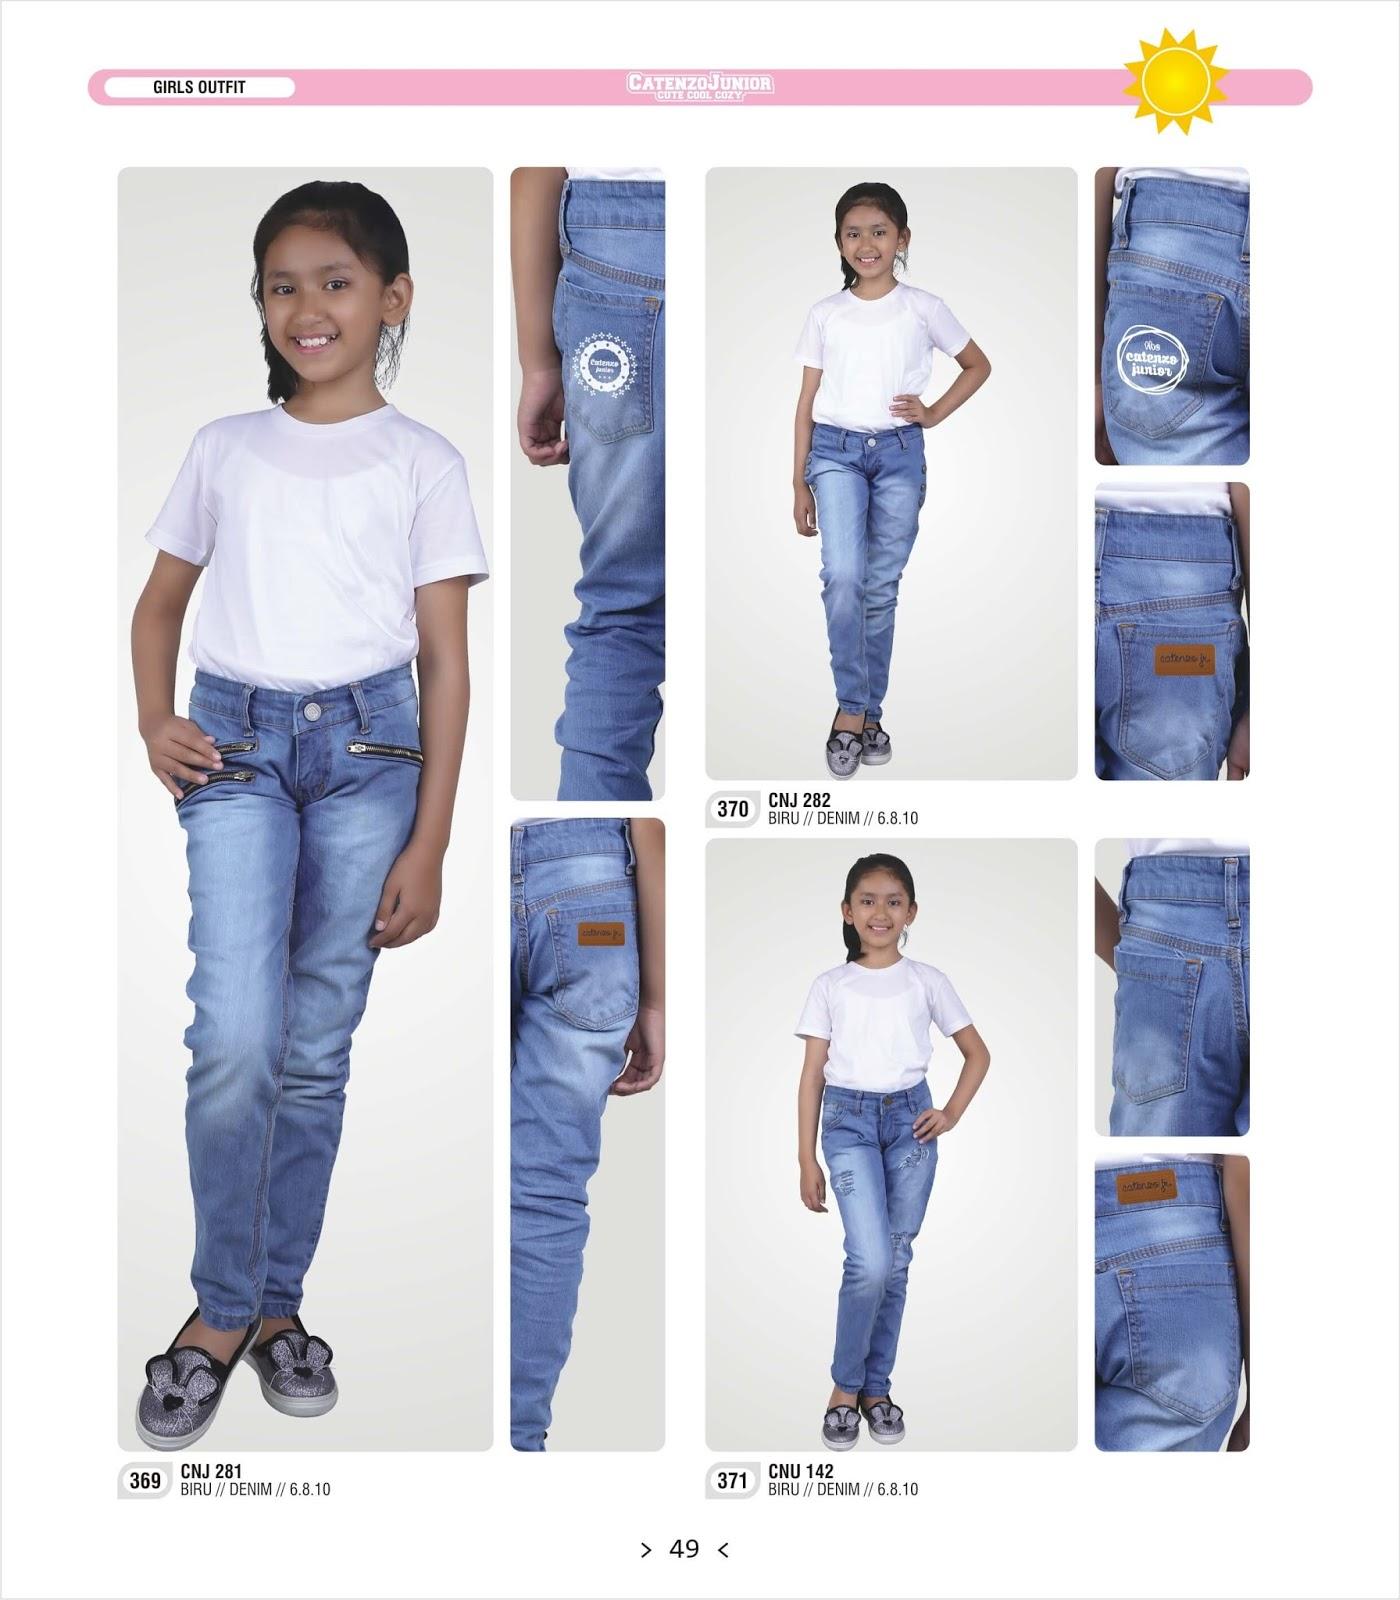 Jual Catenzo Junior Crc 002 Jaket Casual Anak Laki Parasit Distro Cjr Chr 243 Katalog Pakaian